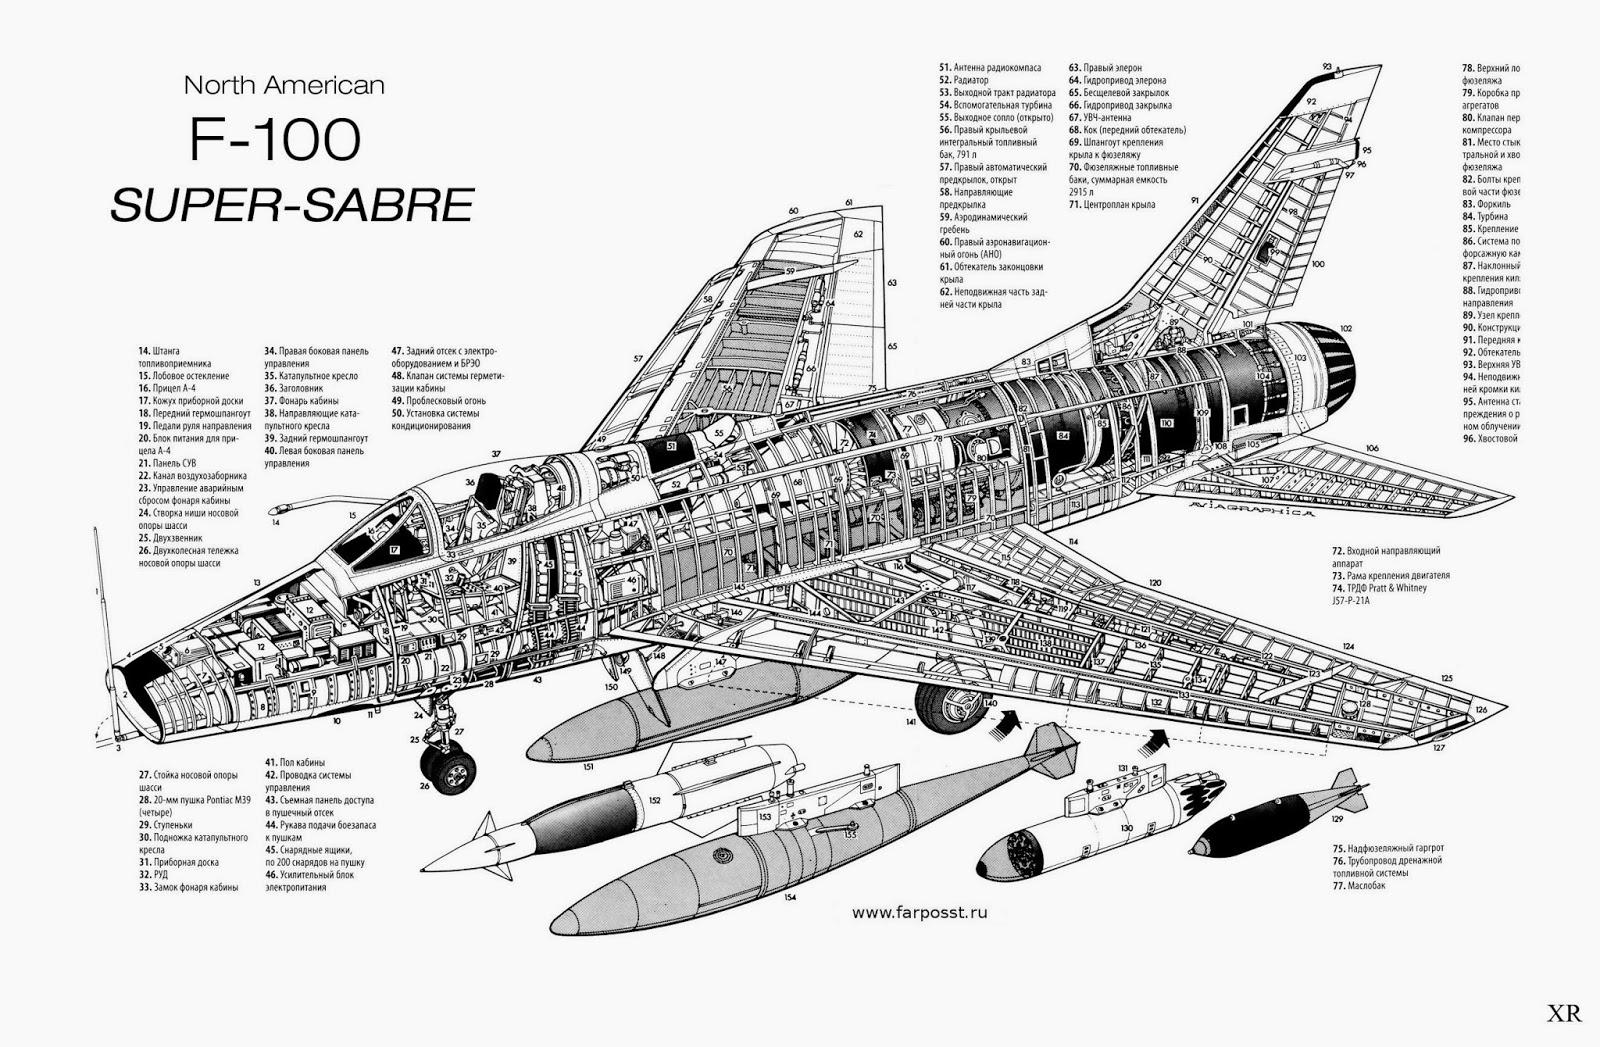 ATOMIC-ANNIHILATION: 1954 North American 'Super-Sabre'